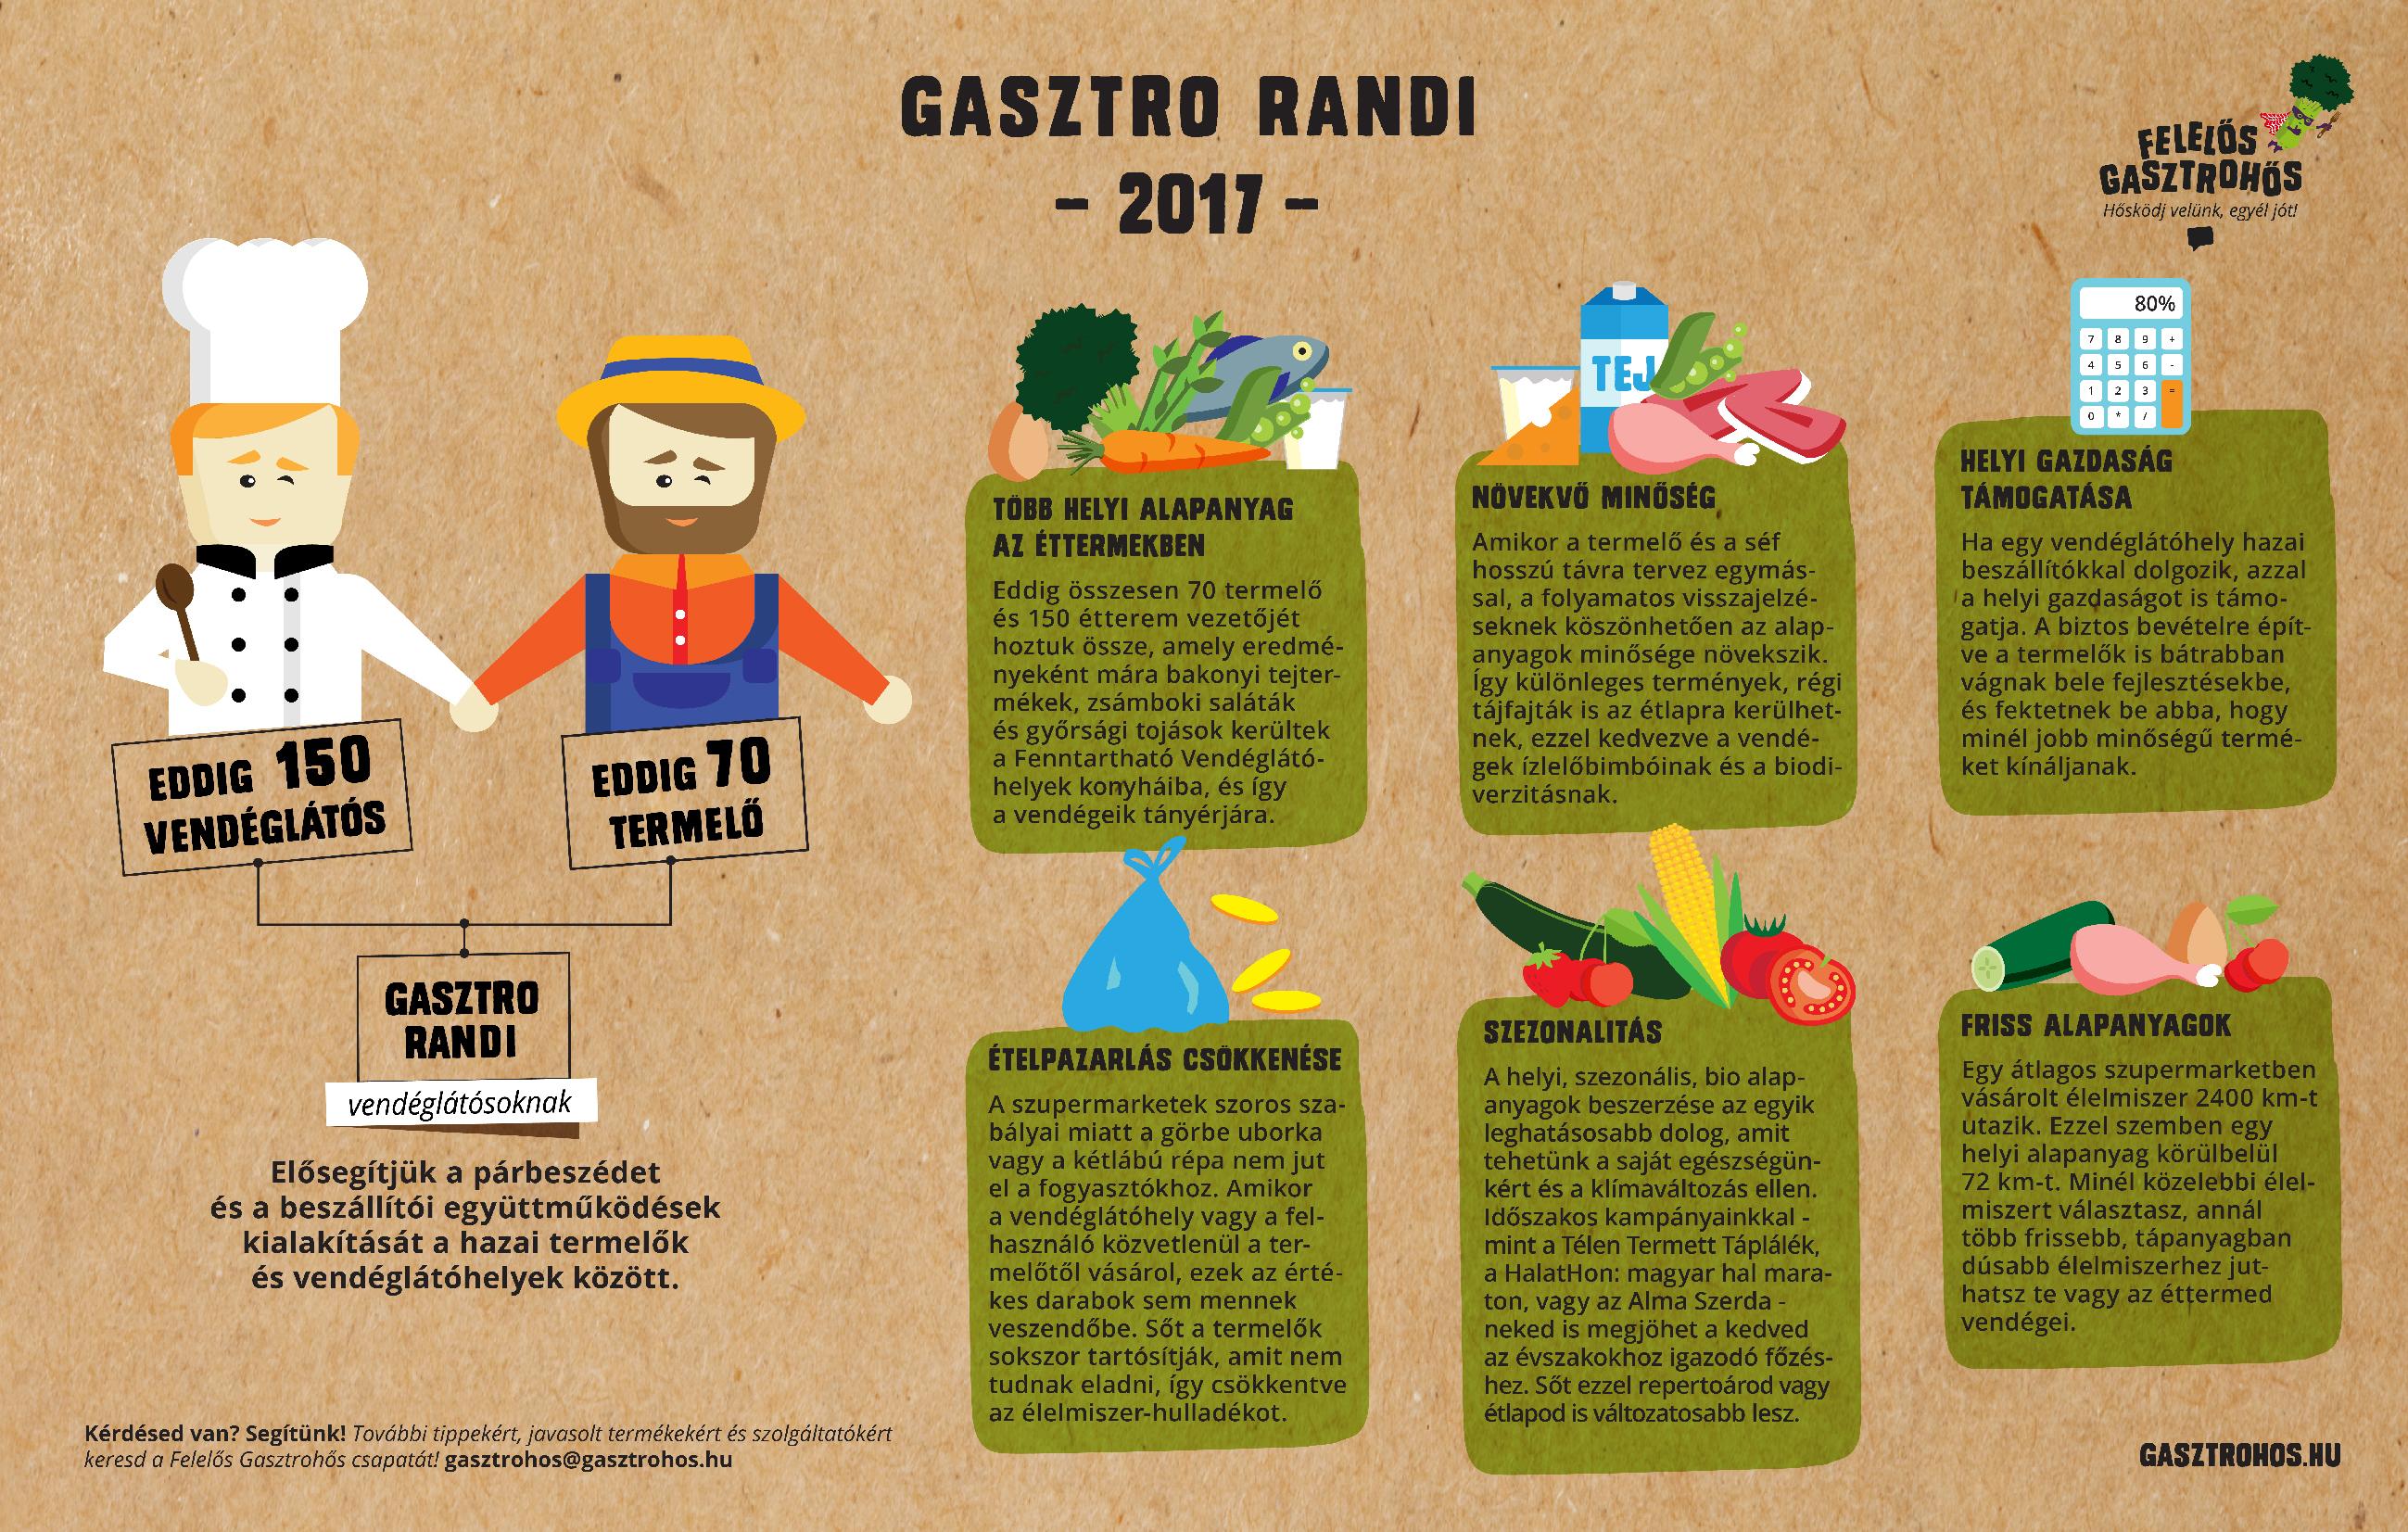 felelos-gasztrohos-gasztro-randi-2017-09-15-01.jpg